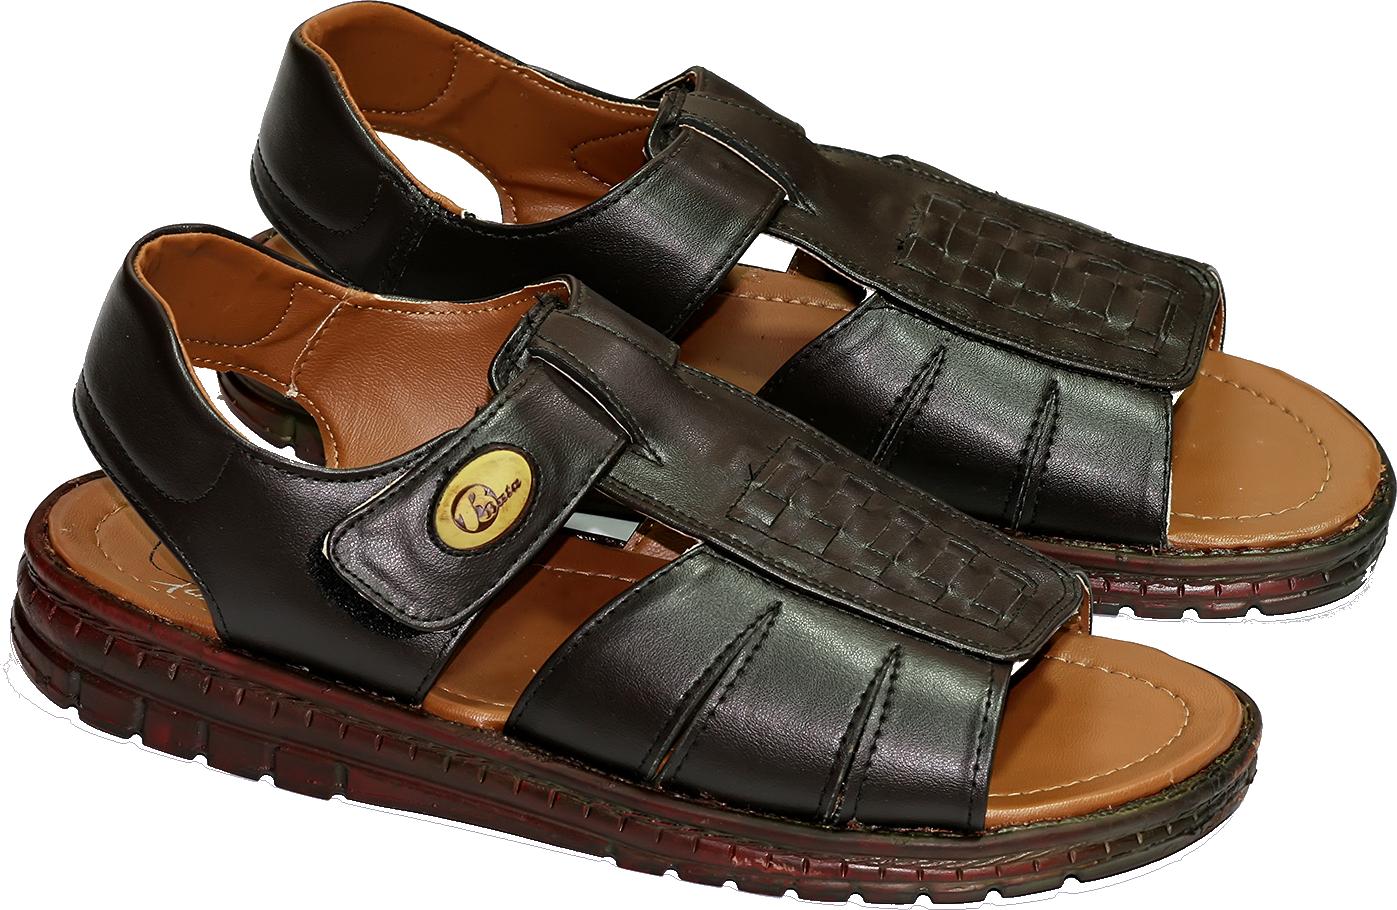 Sandals HD PNG - 118864